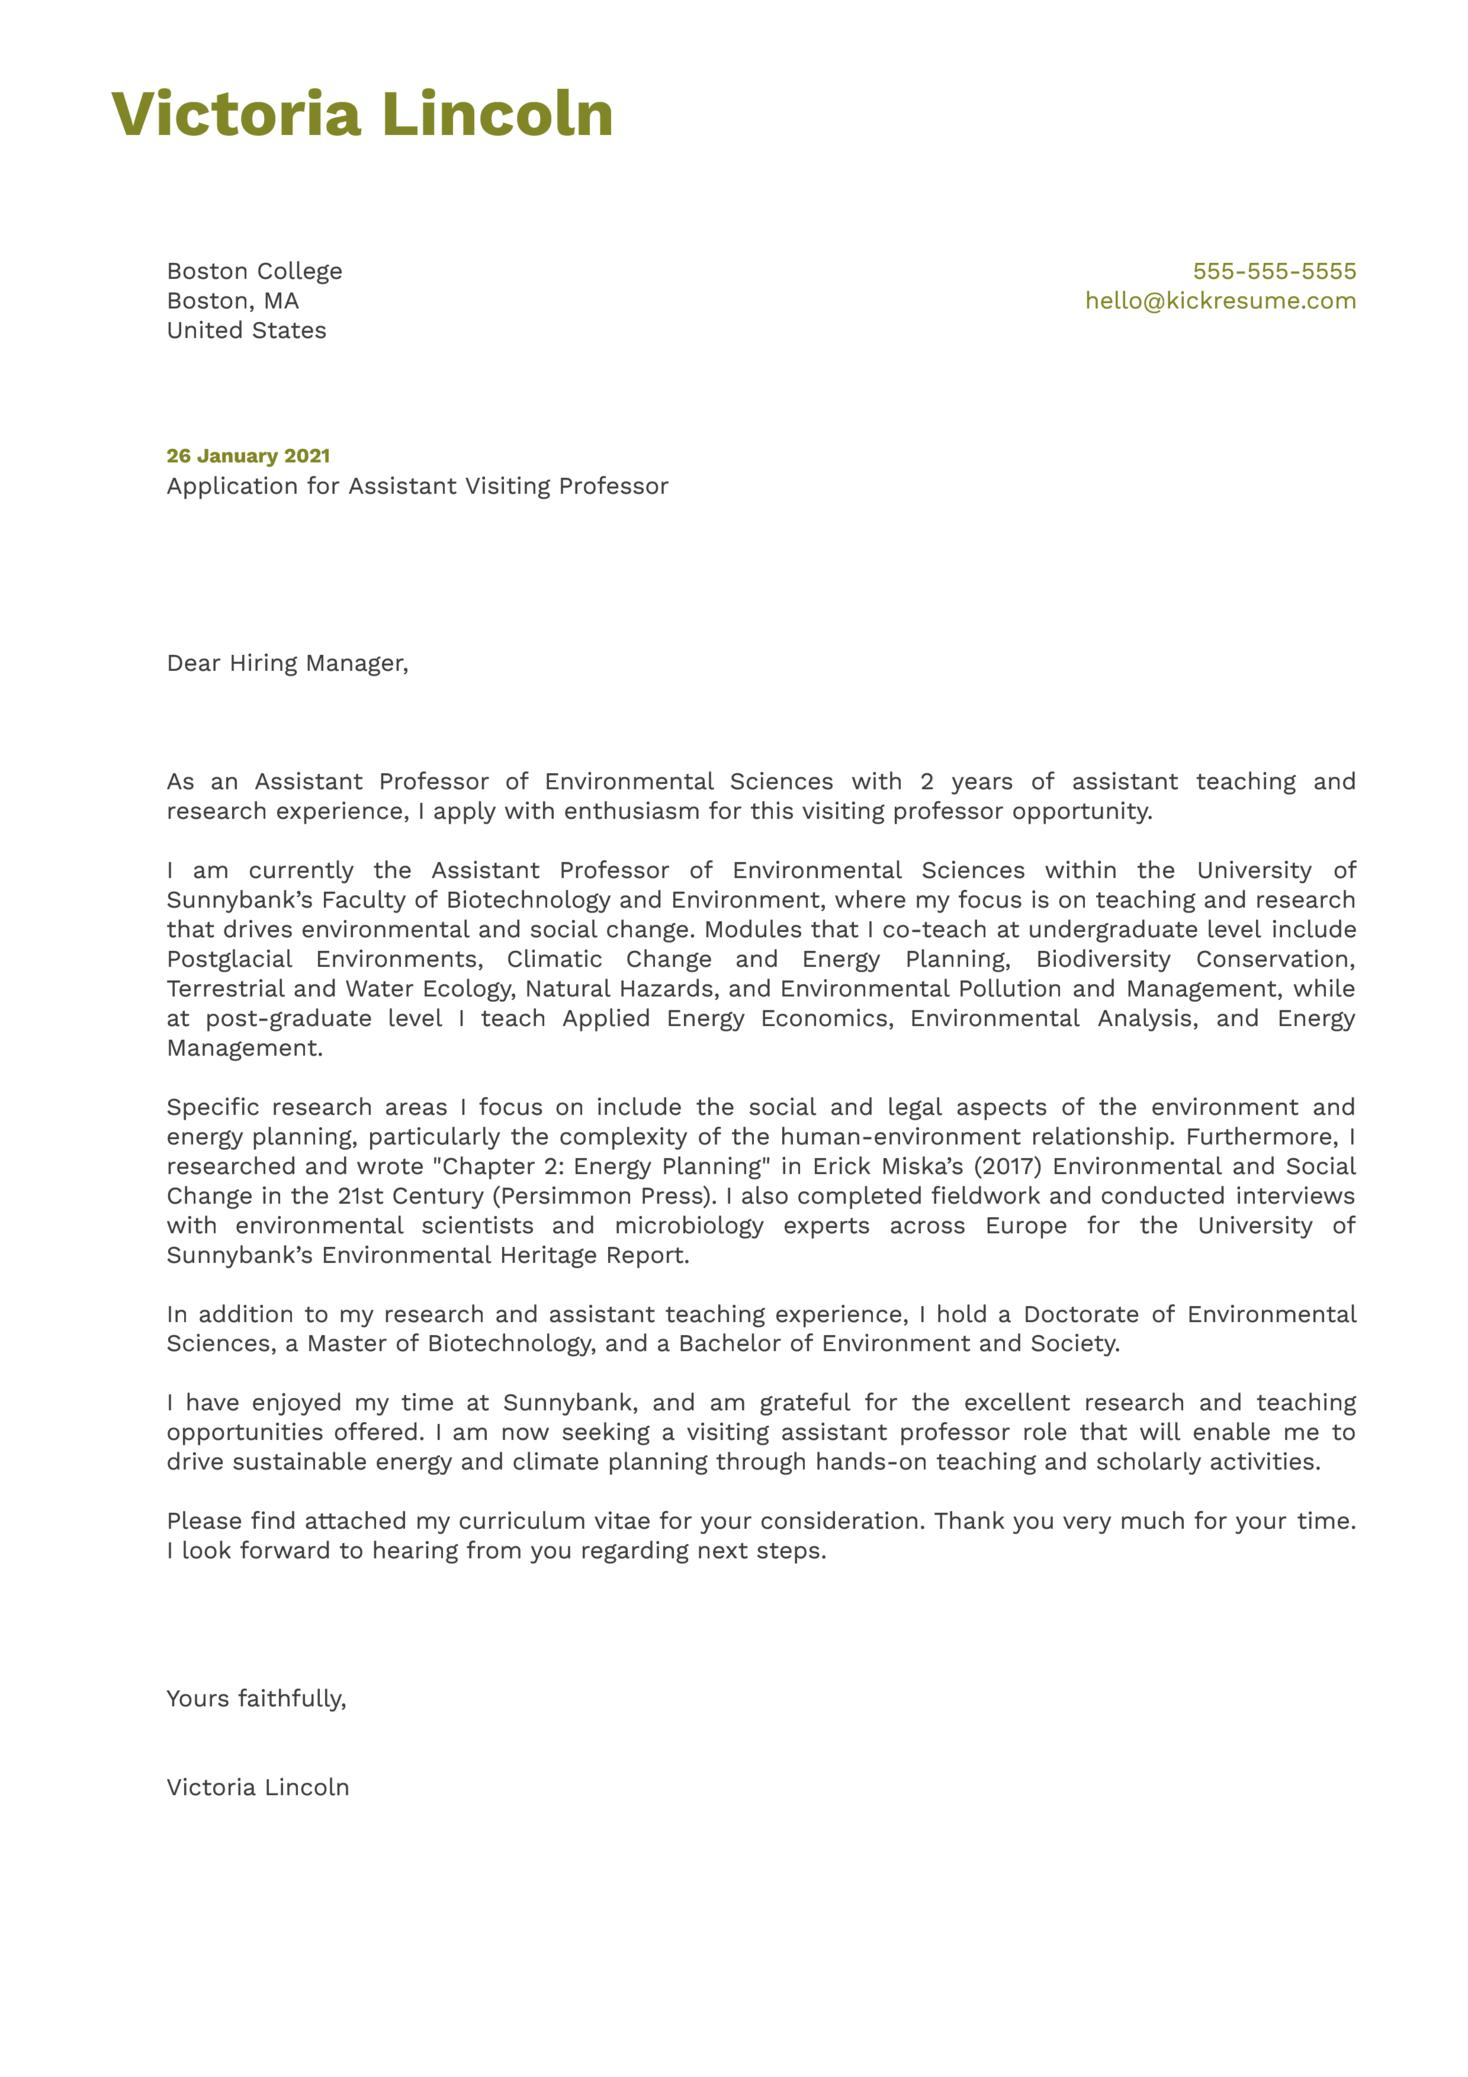 Assistant Visiting Professor Cover Letter Sample